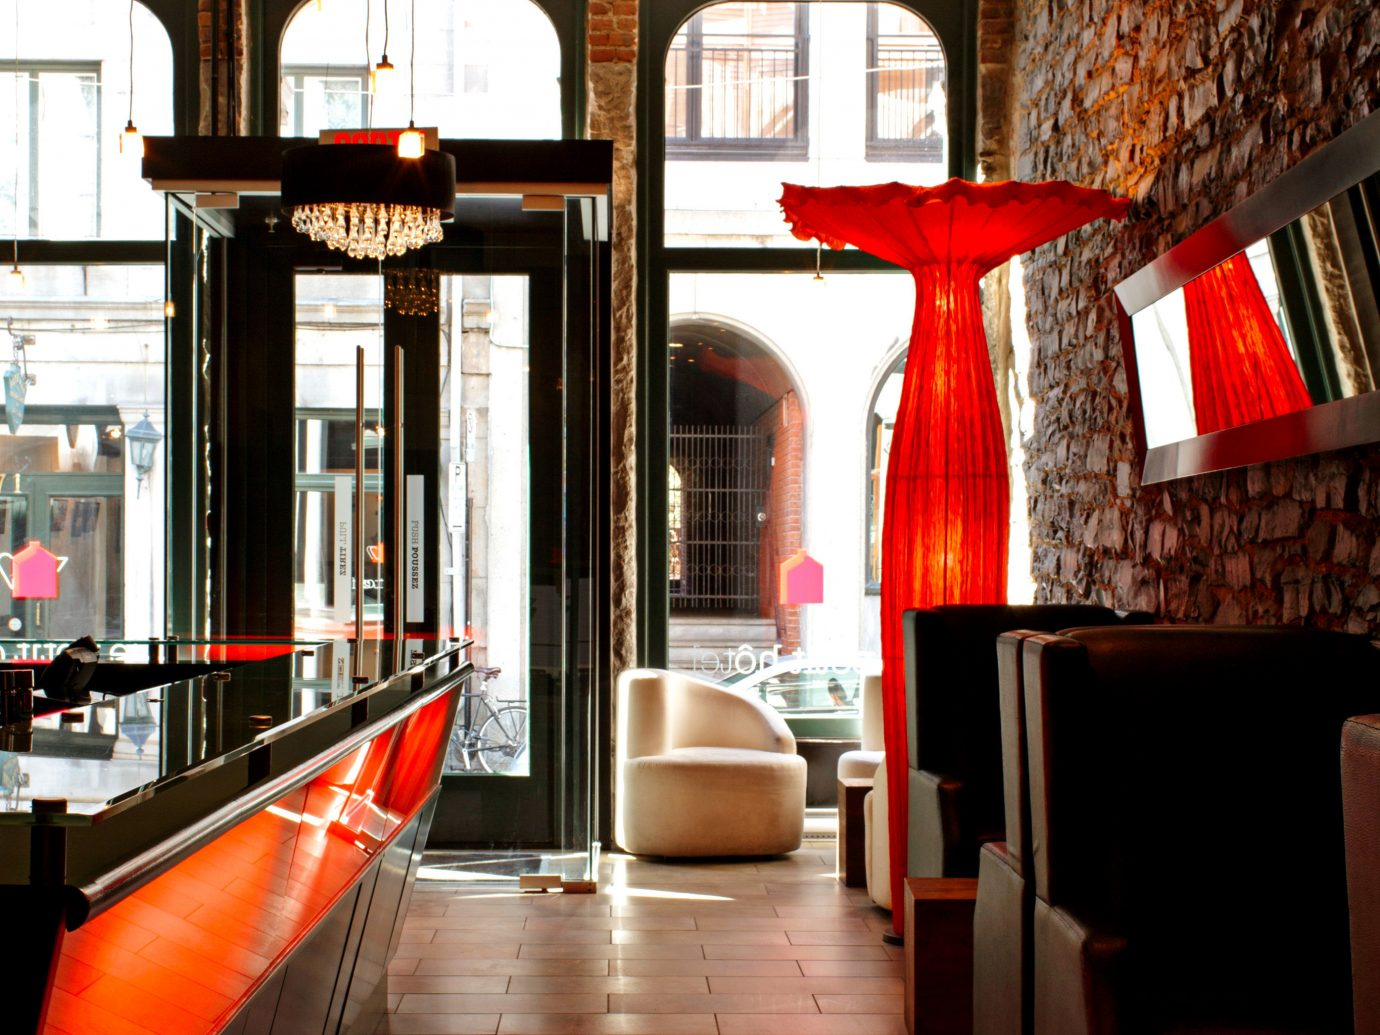 Canada Hip Hotels Living Lobby Lounge Modern Montreal Trip Ideas indoor color restaurant Bar room interior design lighting orange